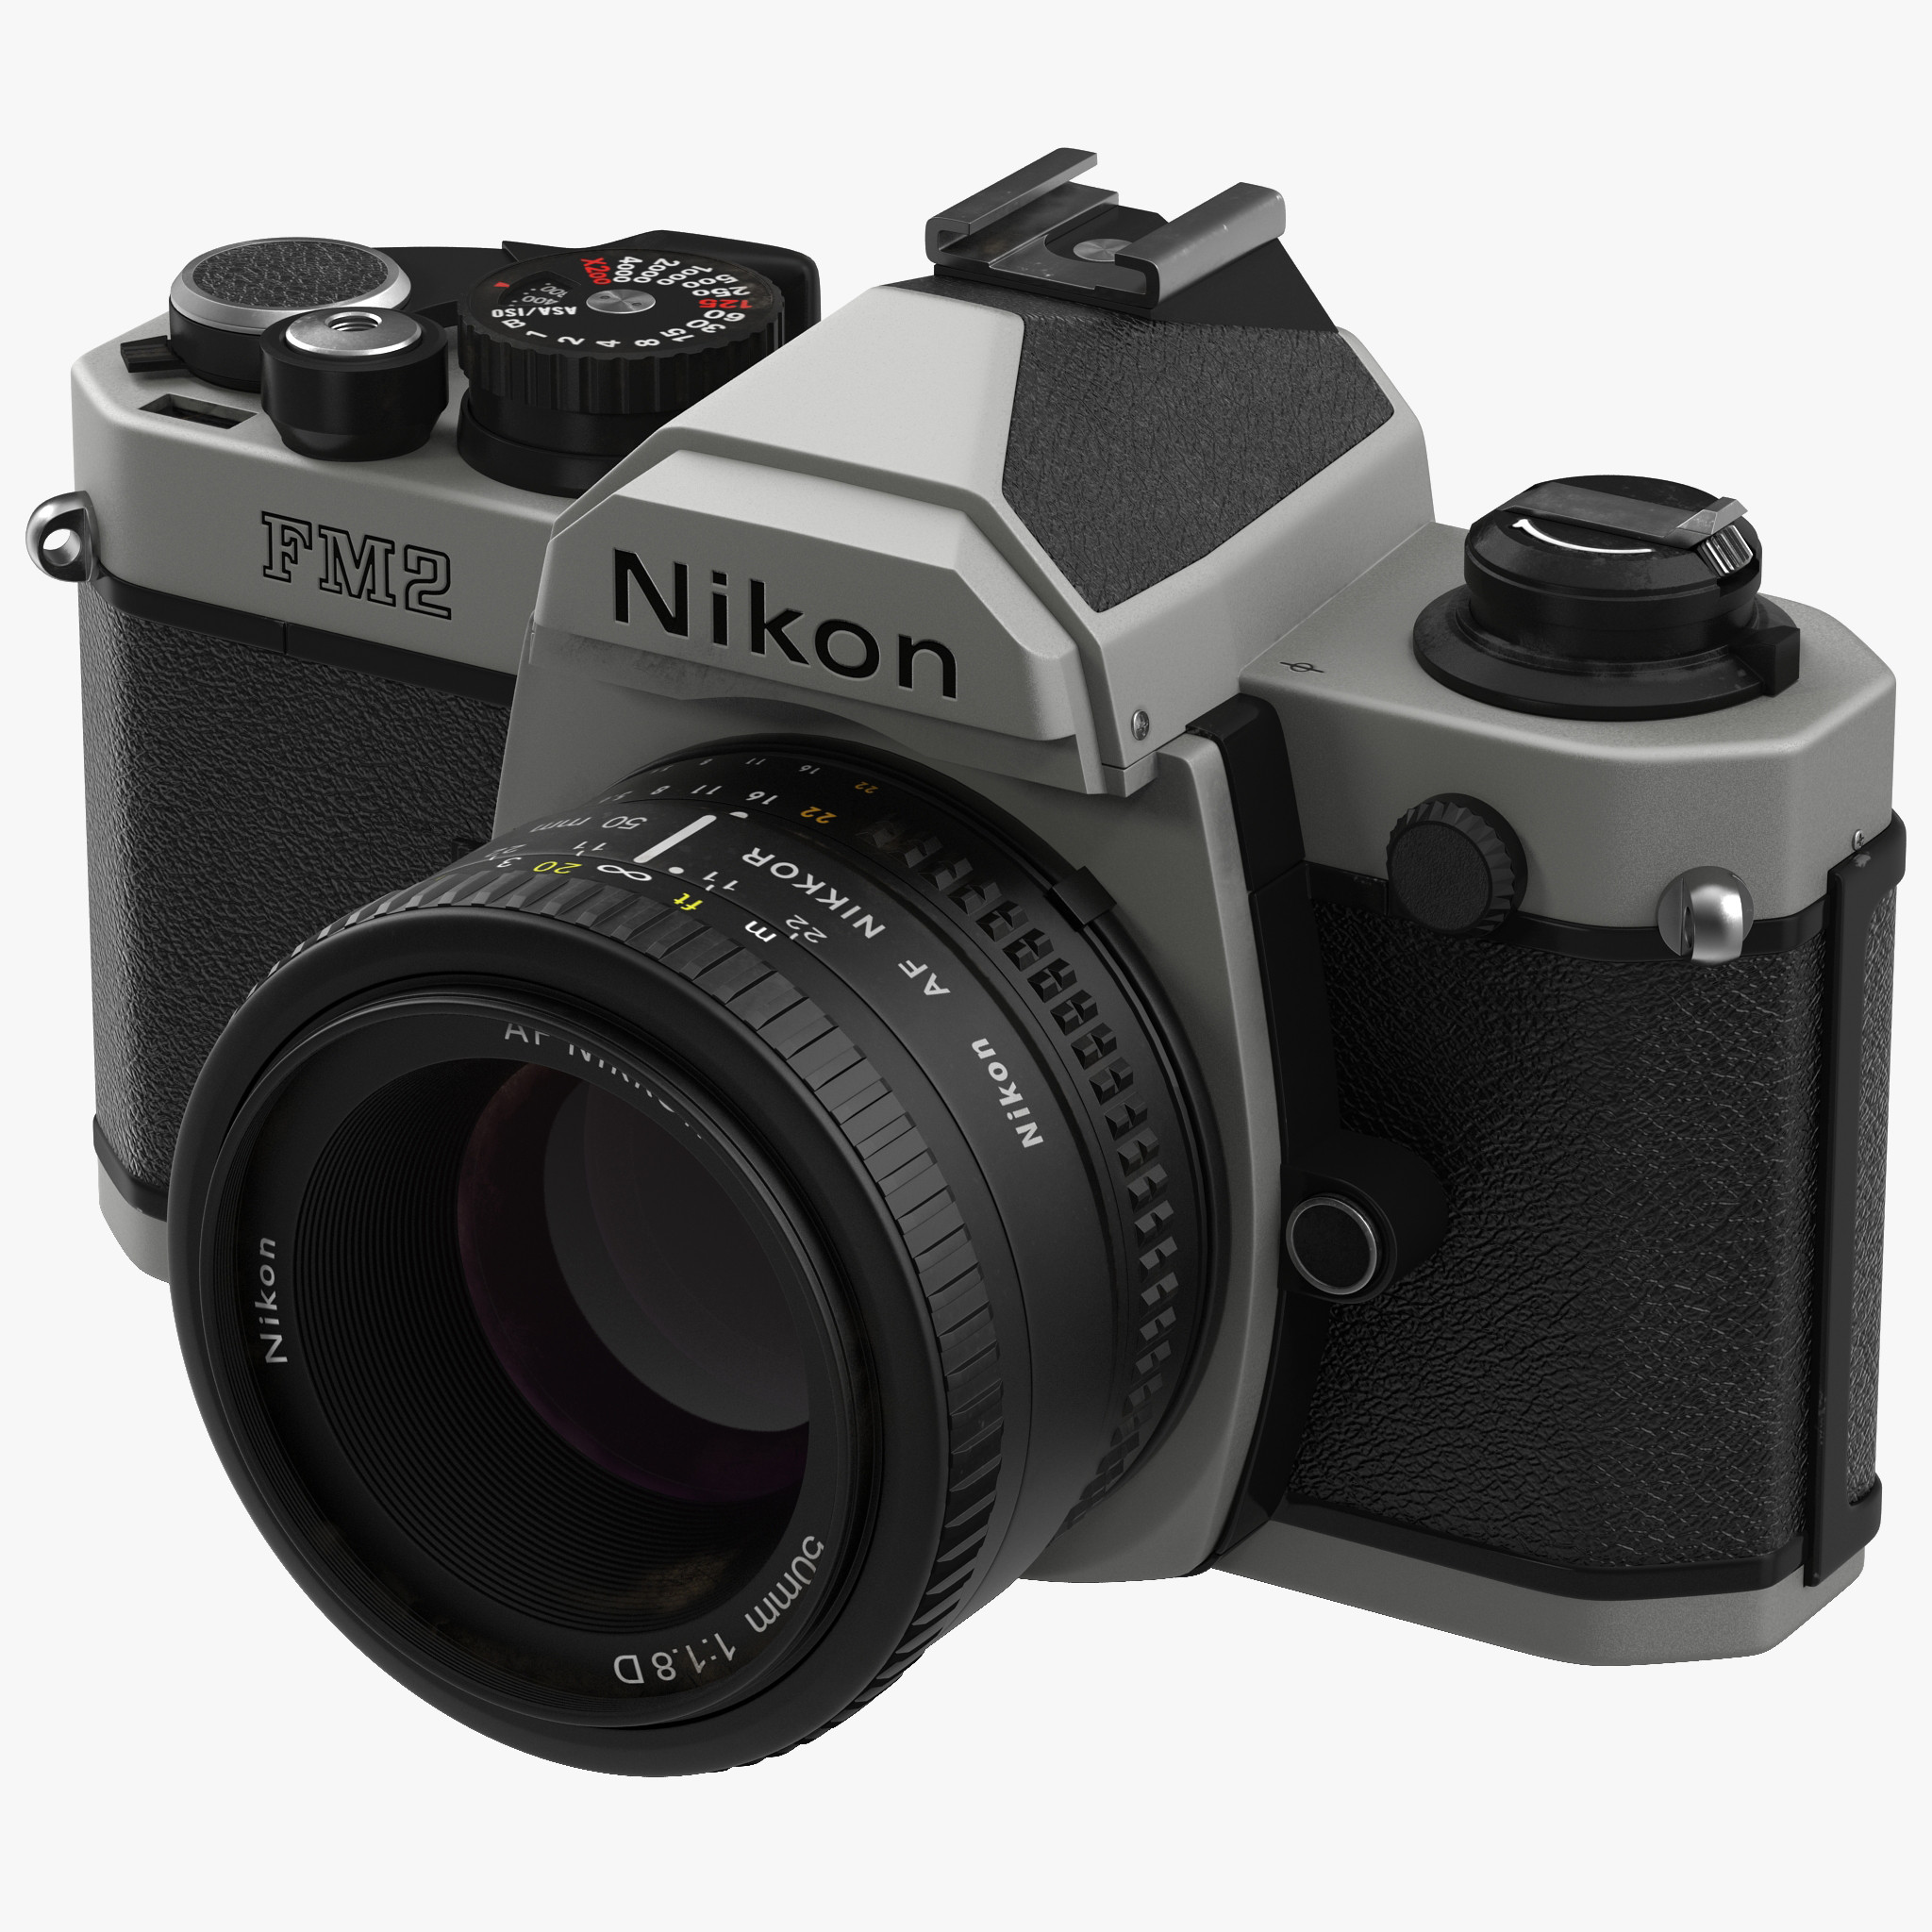 35 mm Film Camera Nikon FM2 3d model 01.jpg